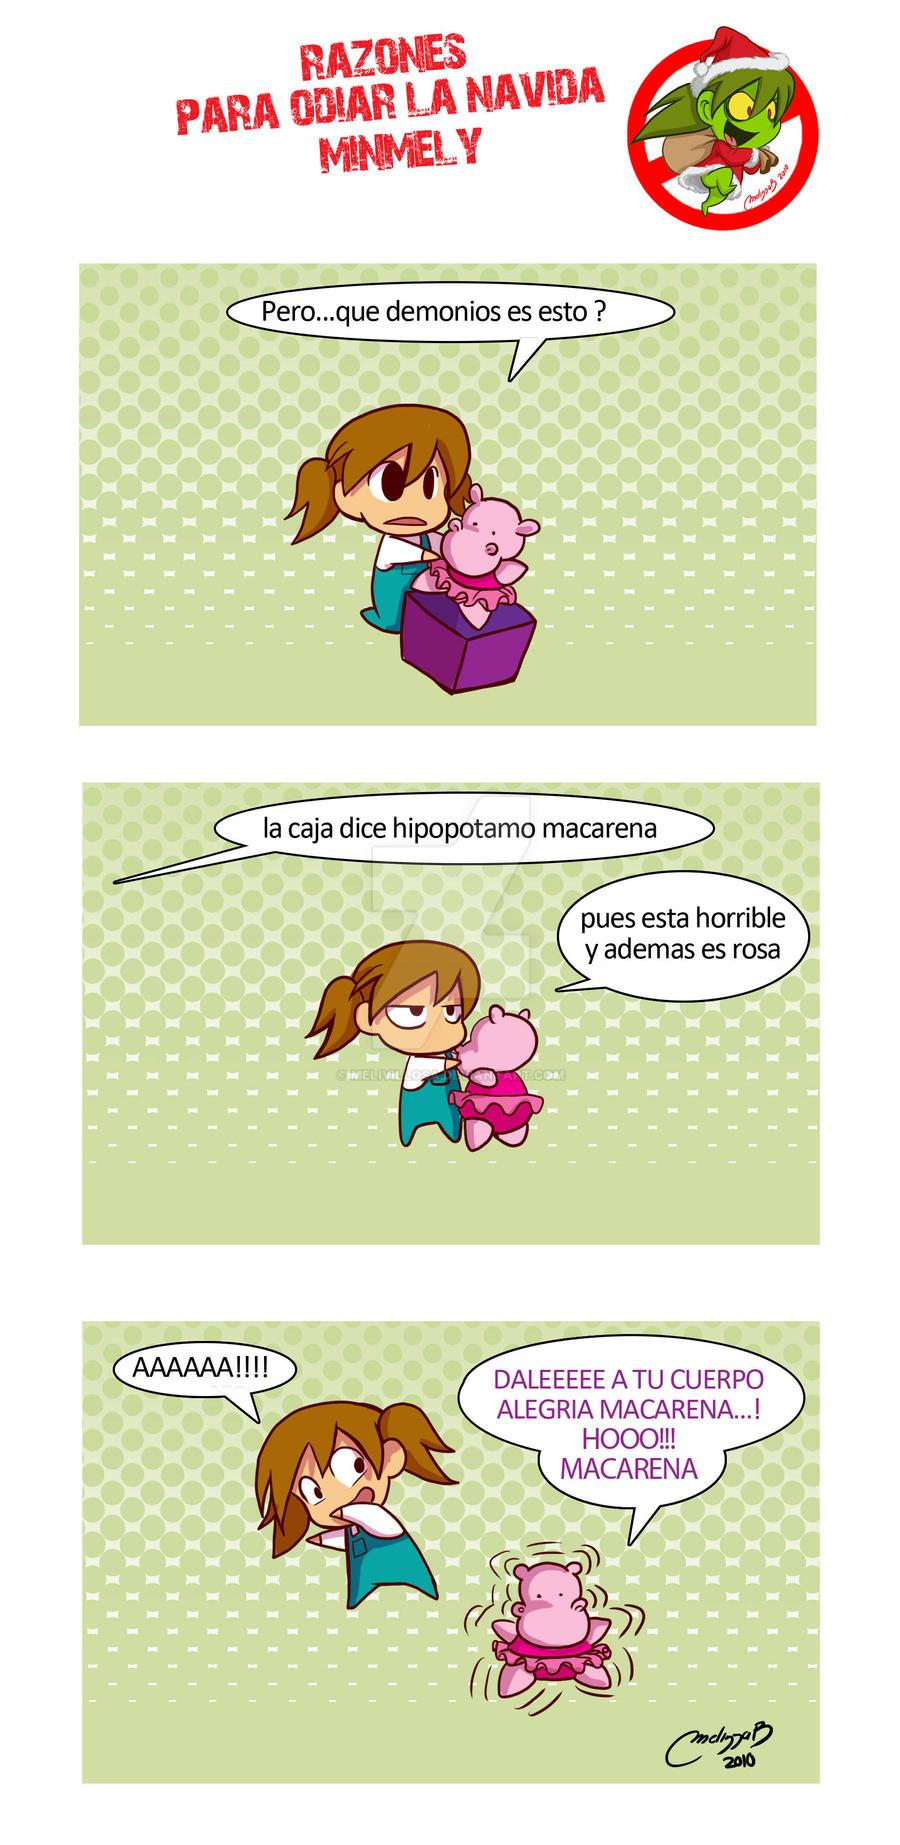 hipo macarena by melivillosa